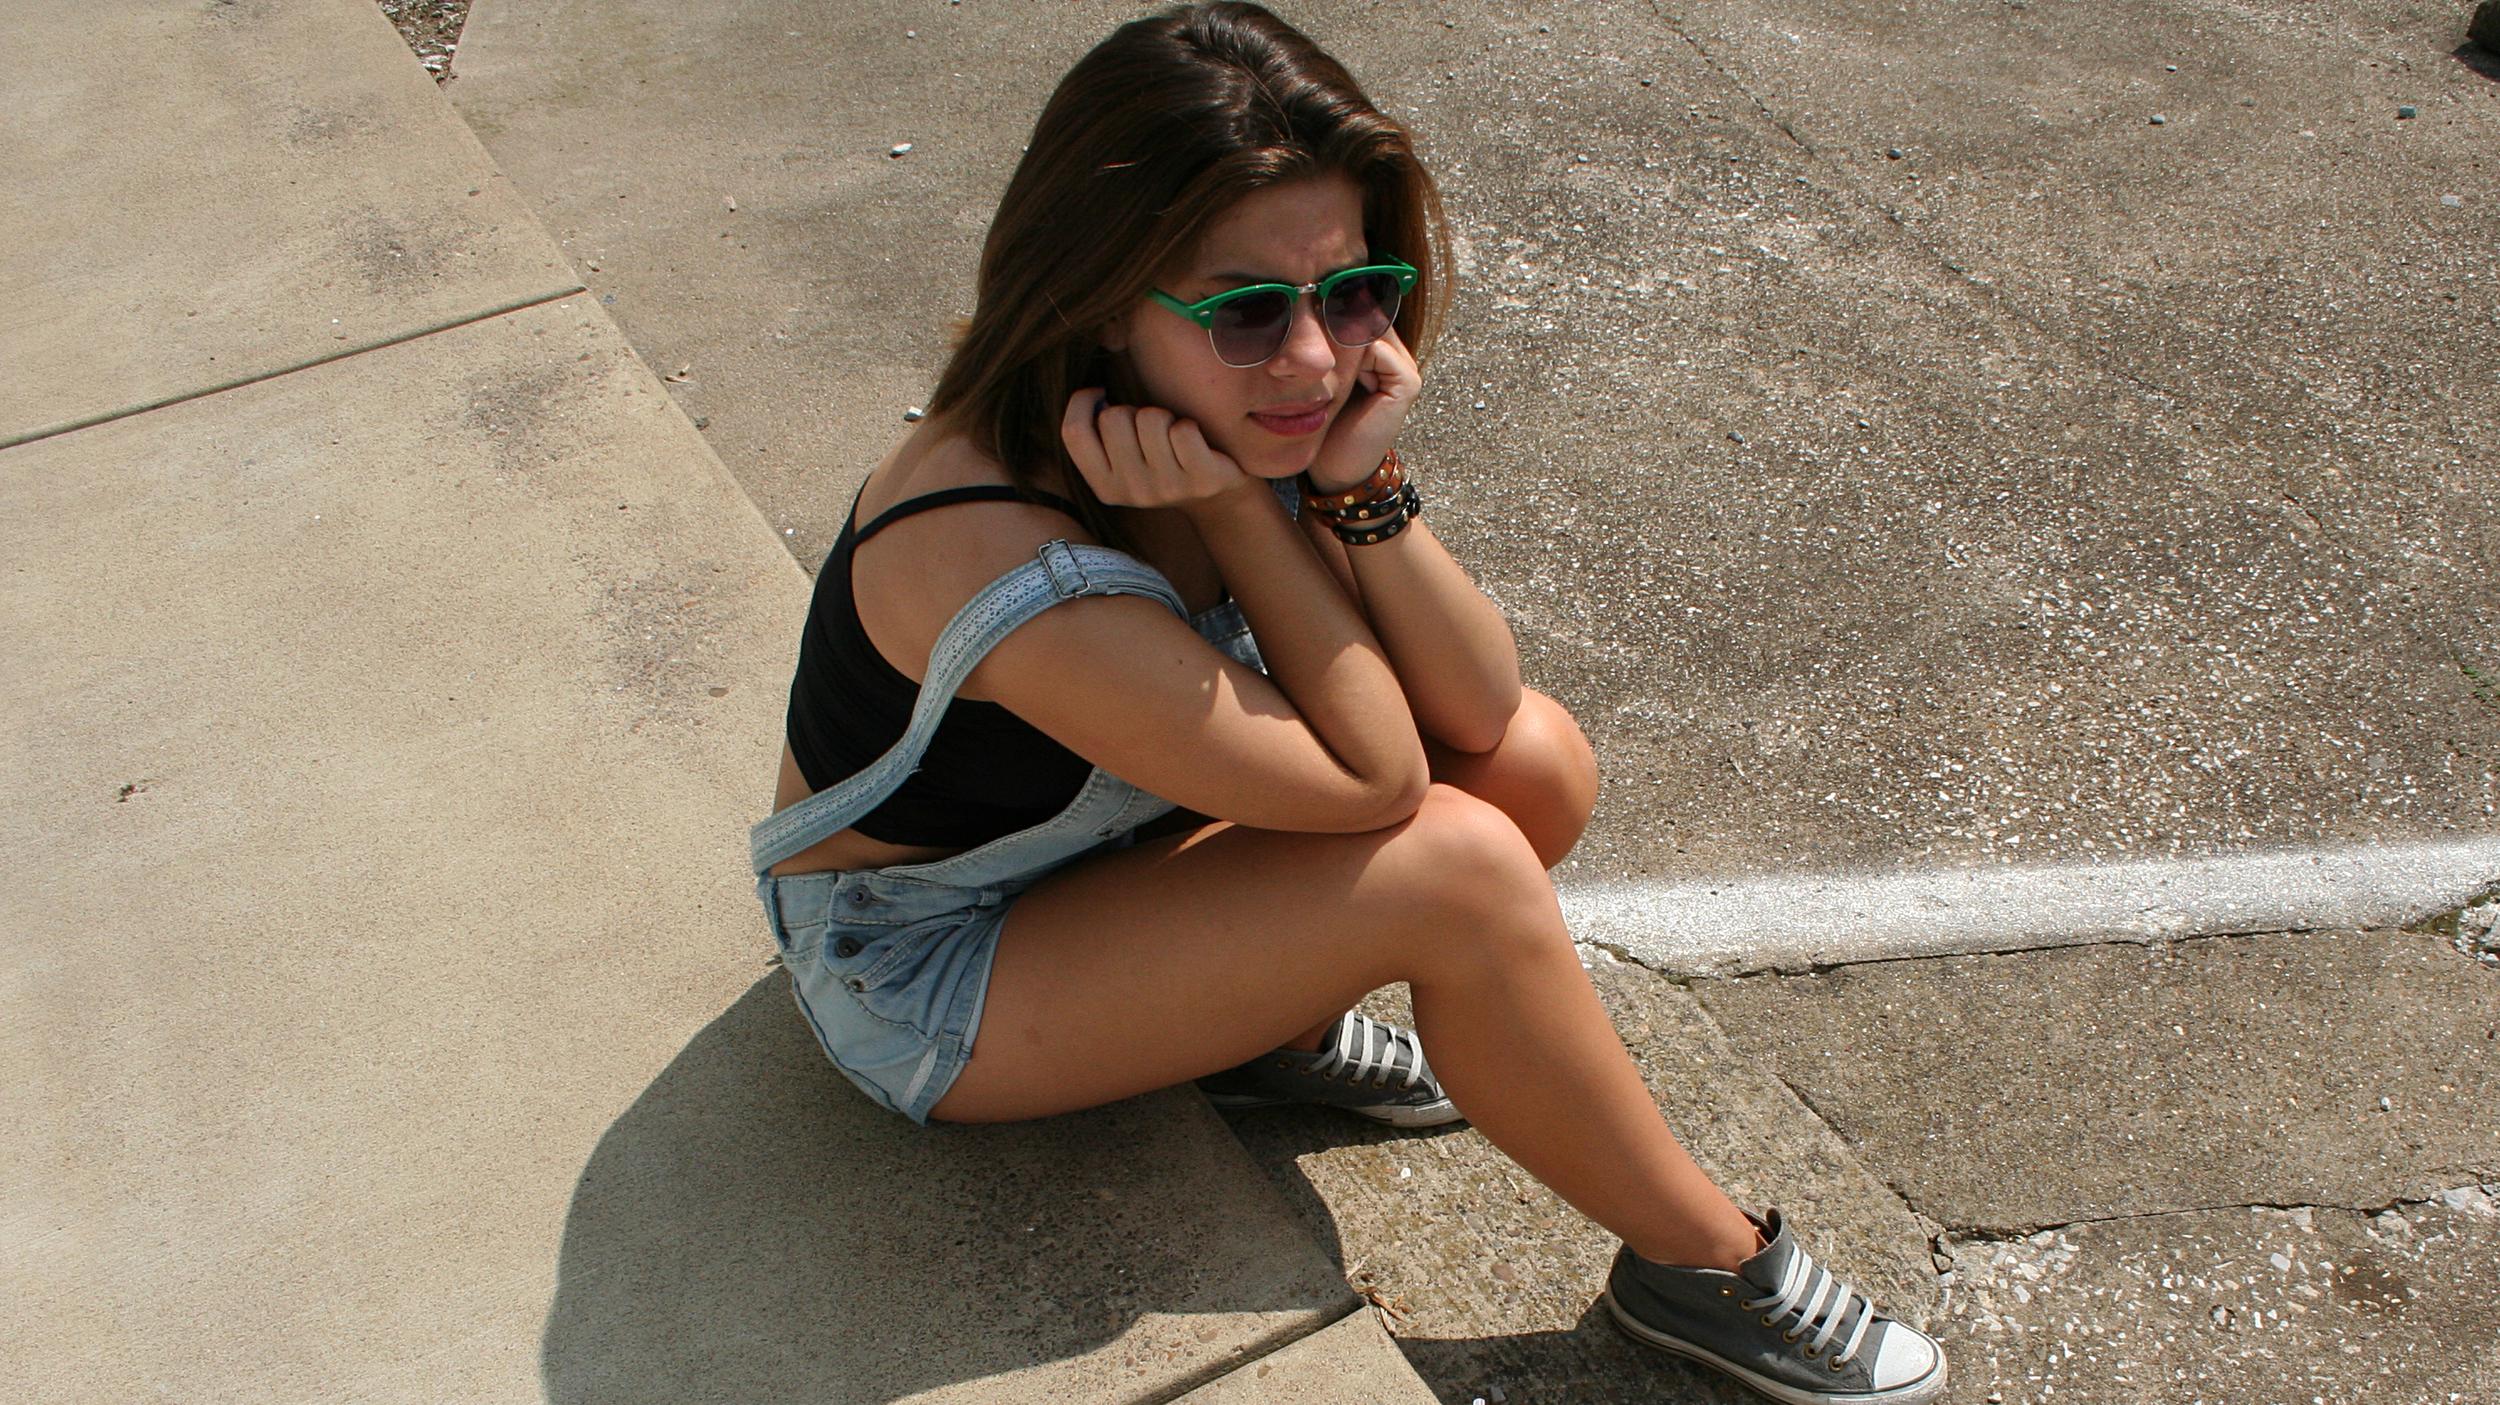 photo: Kae | overalls: Kohl's, black bralet: Forever 21, shoes: Converse